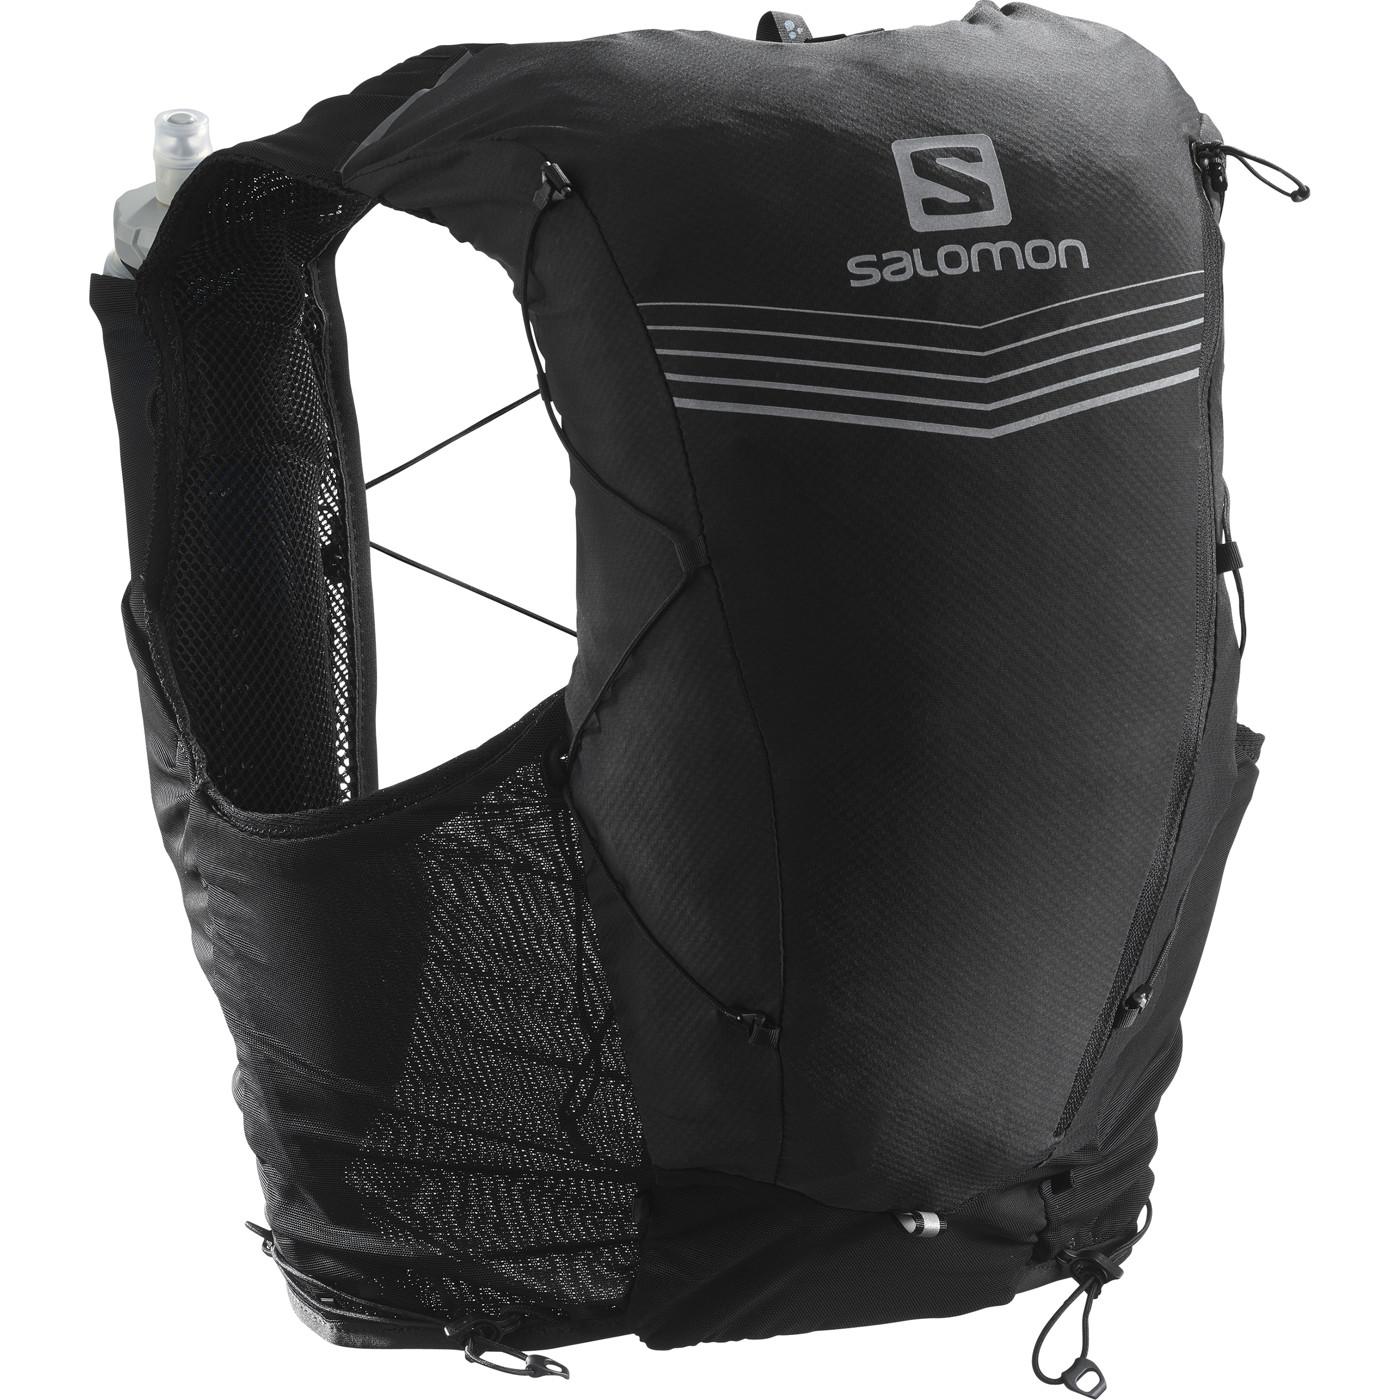 SALOMON ADV SKIN 12 SET Black S